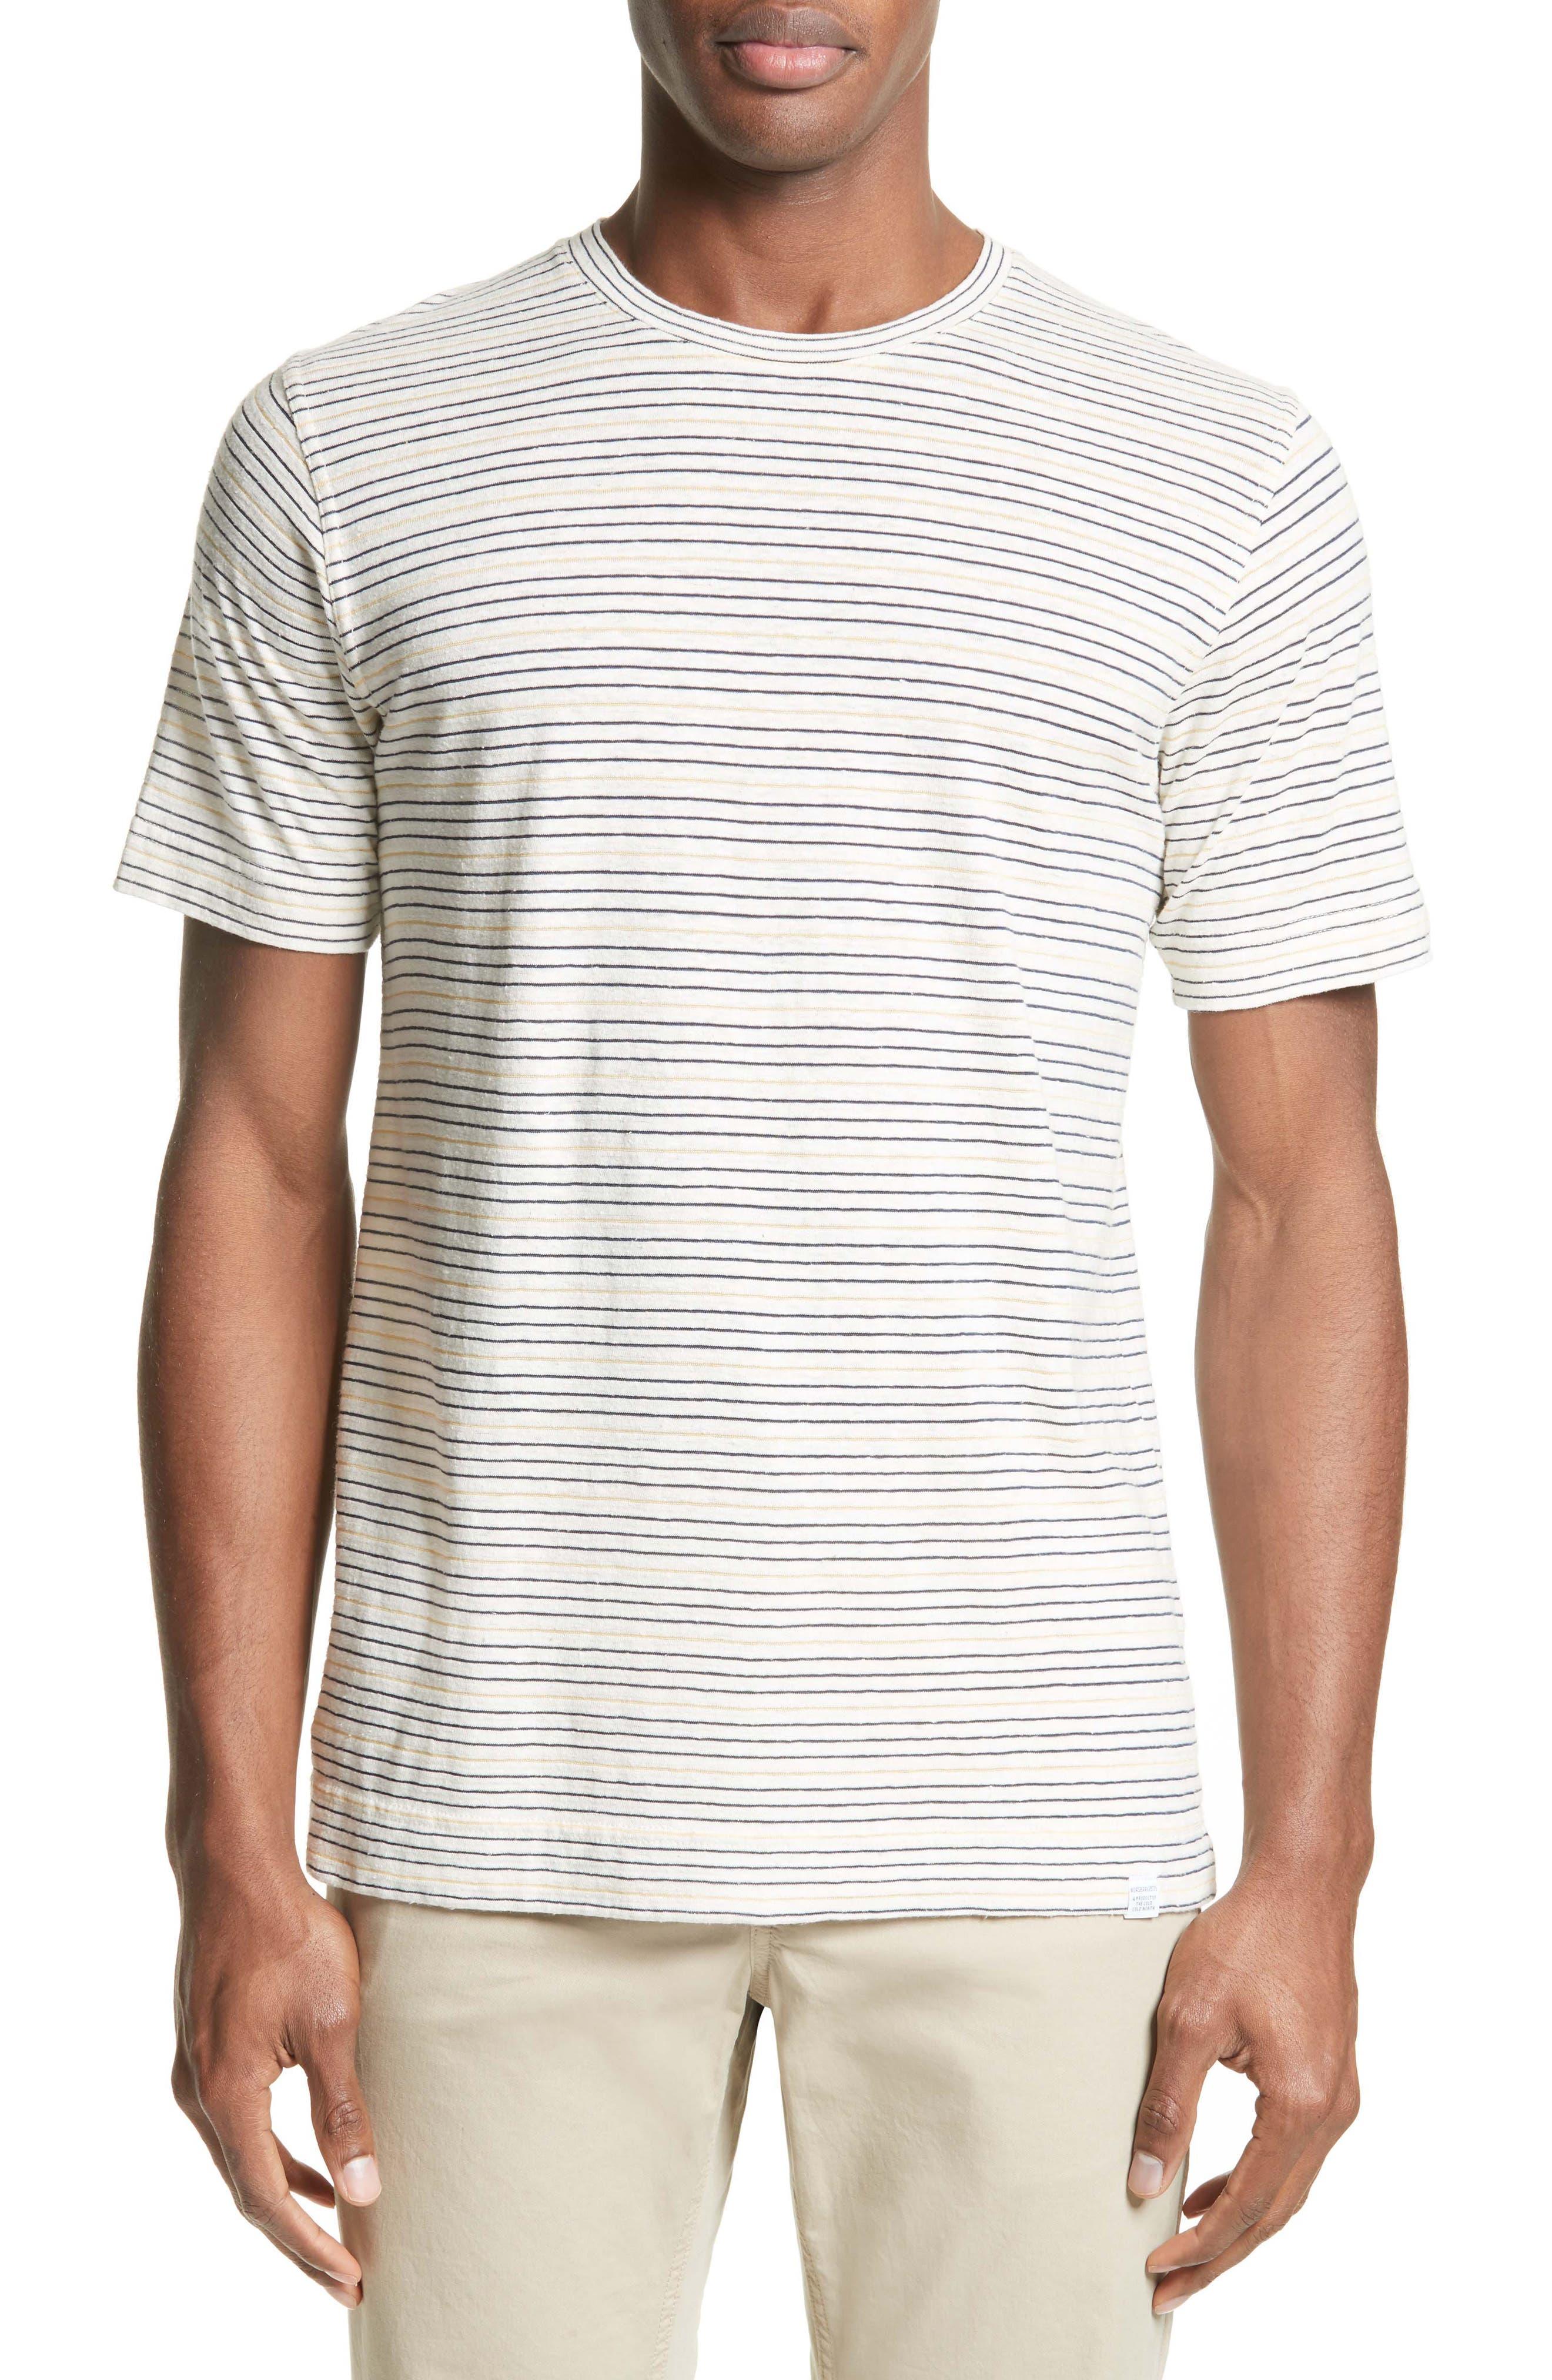 Stripe T-Shirt,                             Main thumbnail 1, color,                             Dried Olive/ Ecru